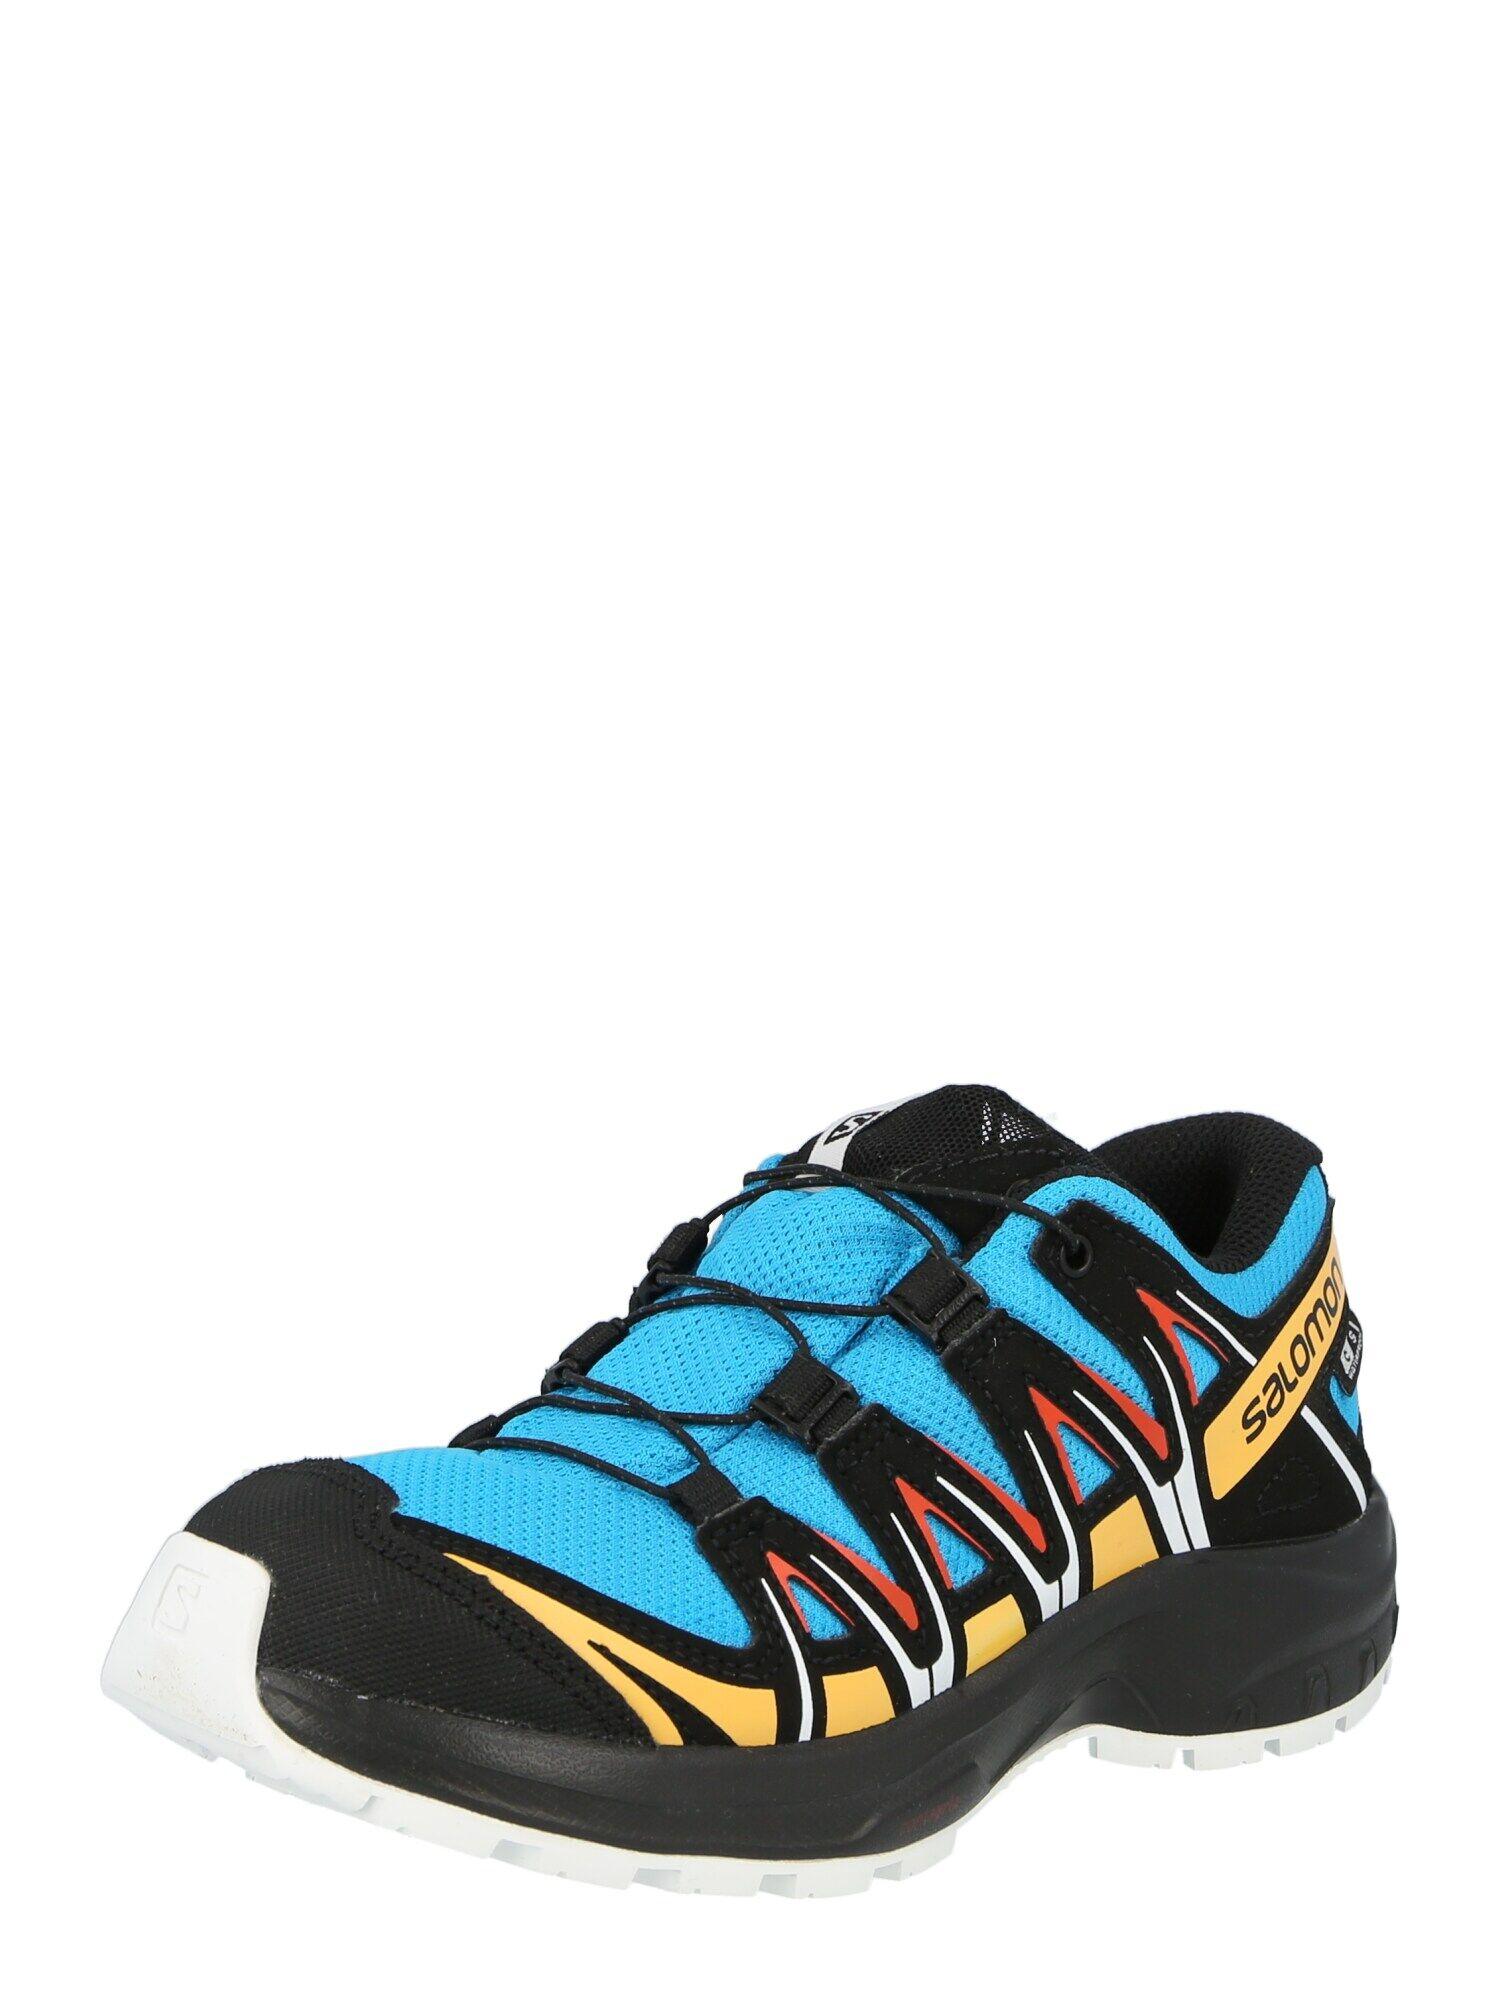 SALOMON Chaussures basses  - Bleu - Taille: 35 - boy